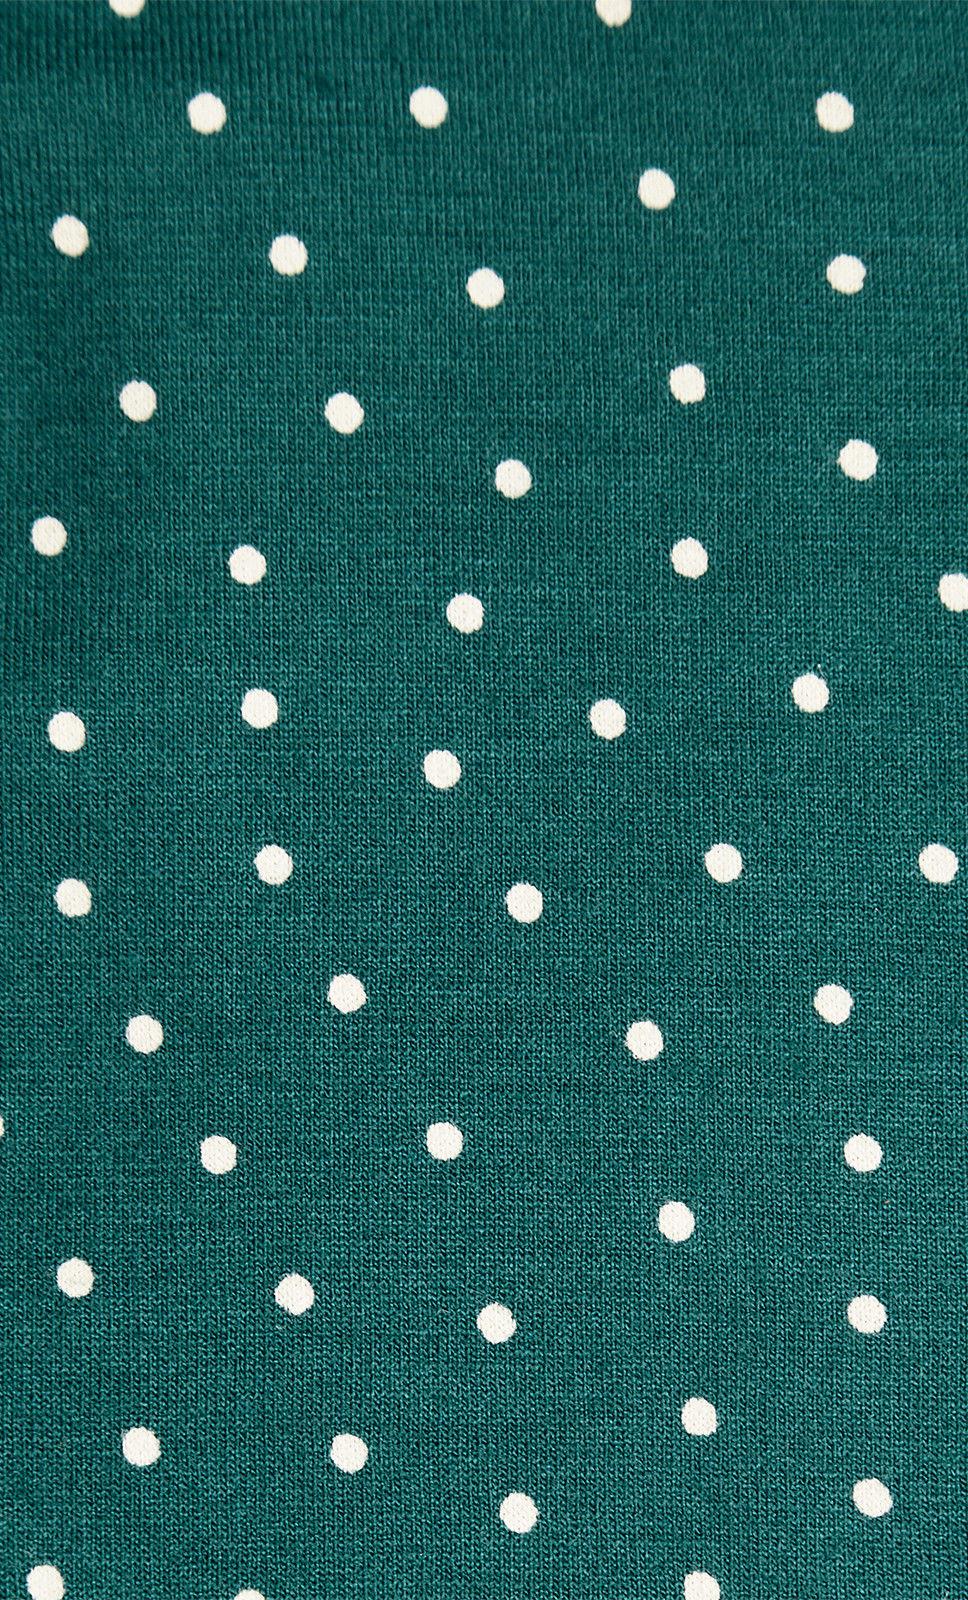 Little-dots-Dragonfly-Green